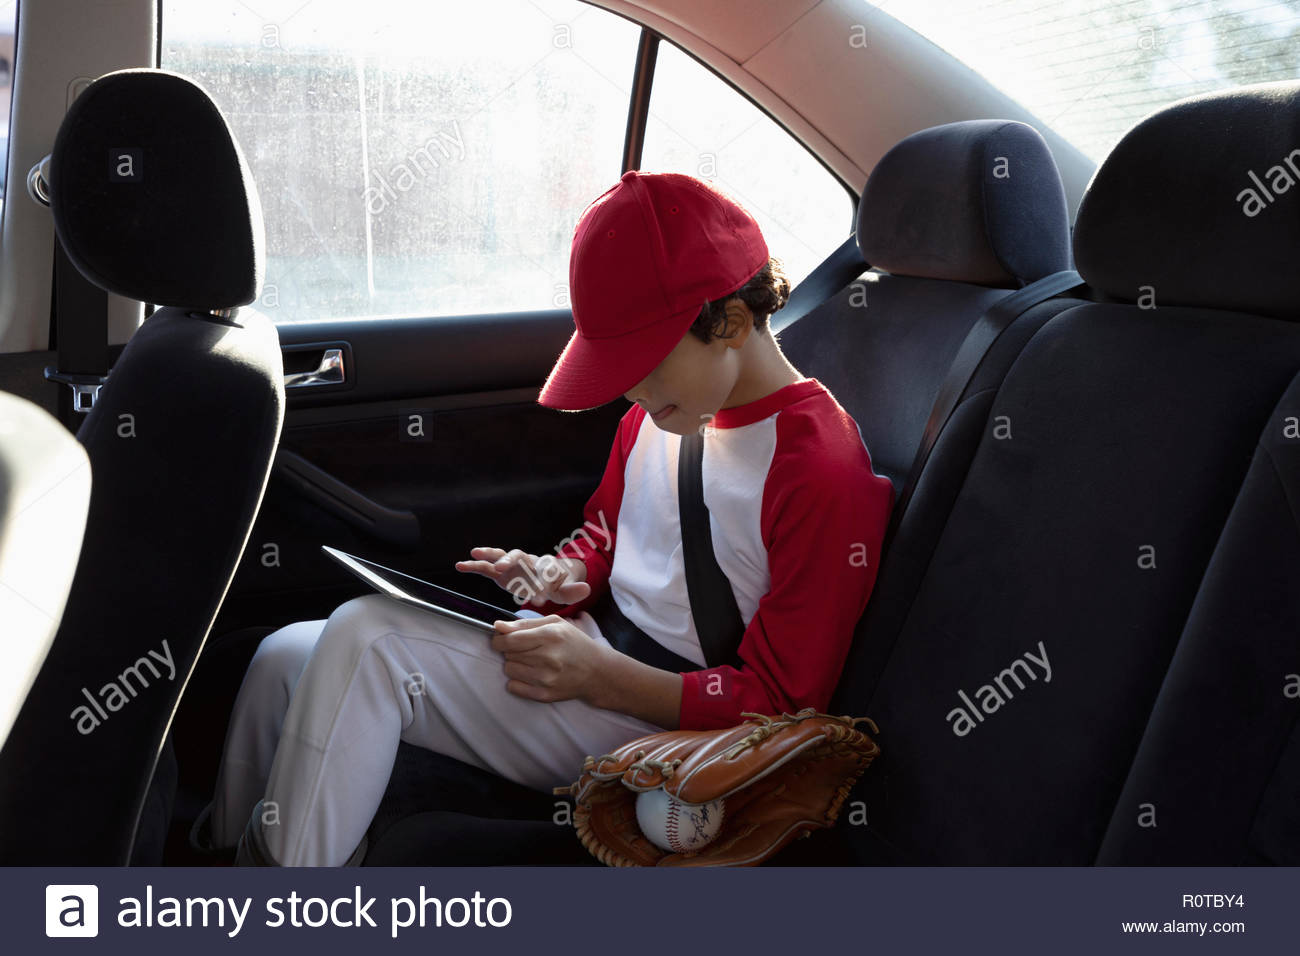 Garçon en uniforme de baseball using digital tablet in back seat of car Photo Stock